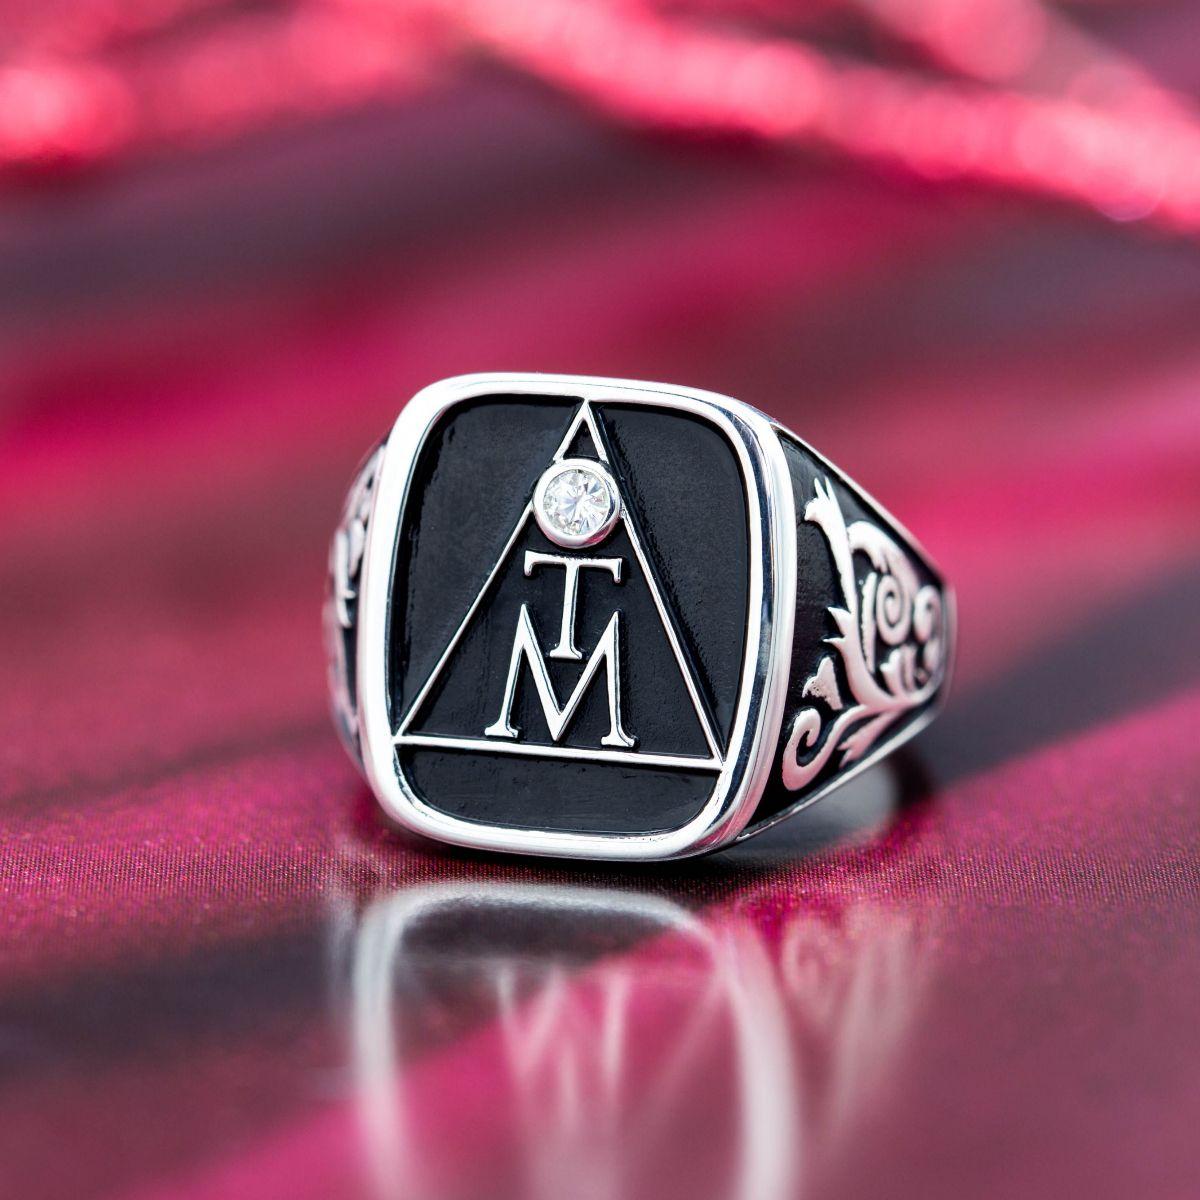 Design Your Own Ring: Design Your Own Monogram Signet